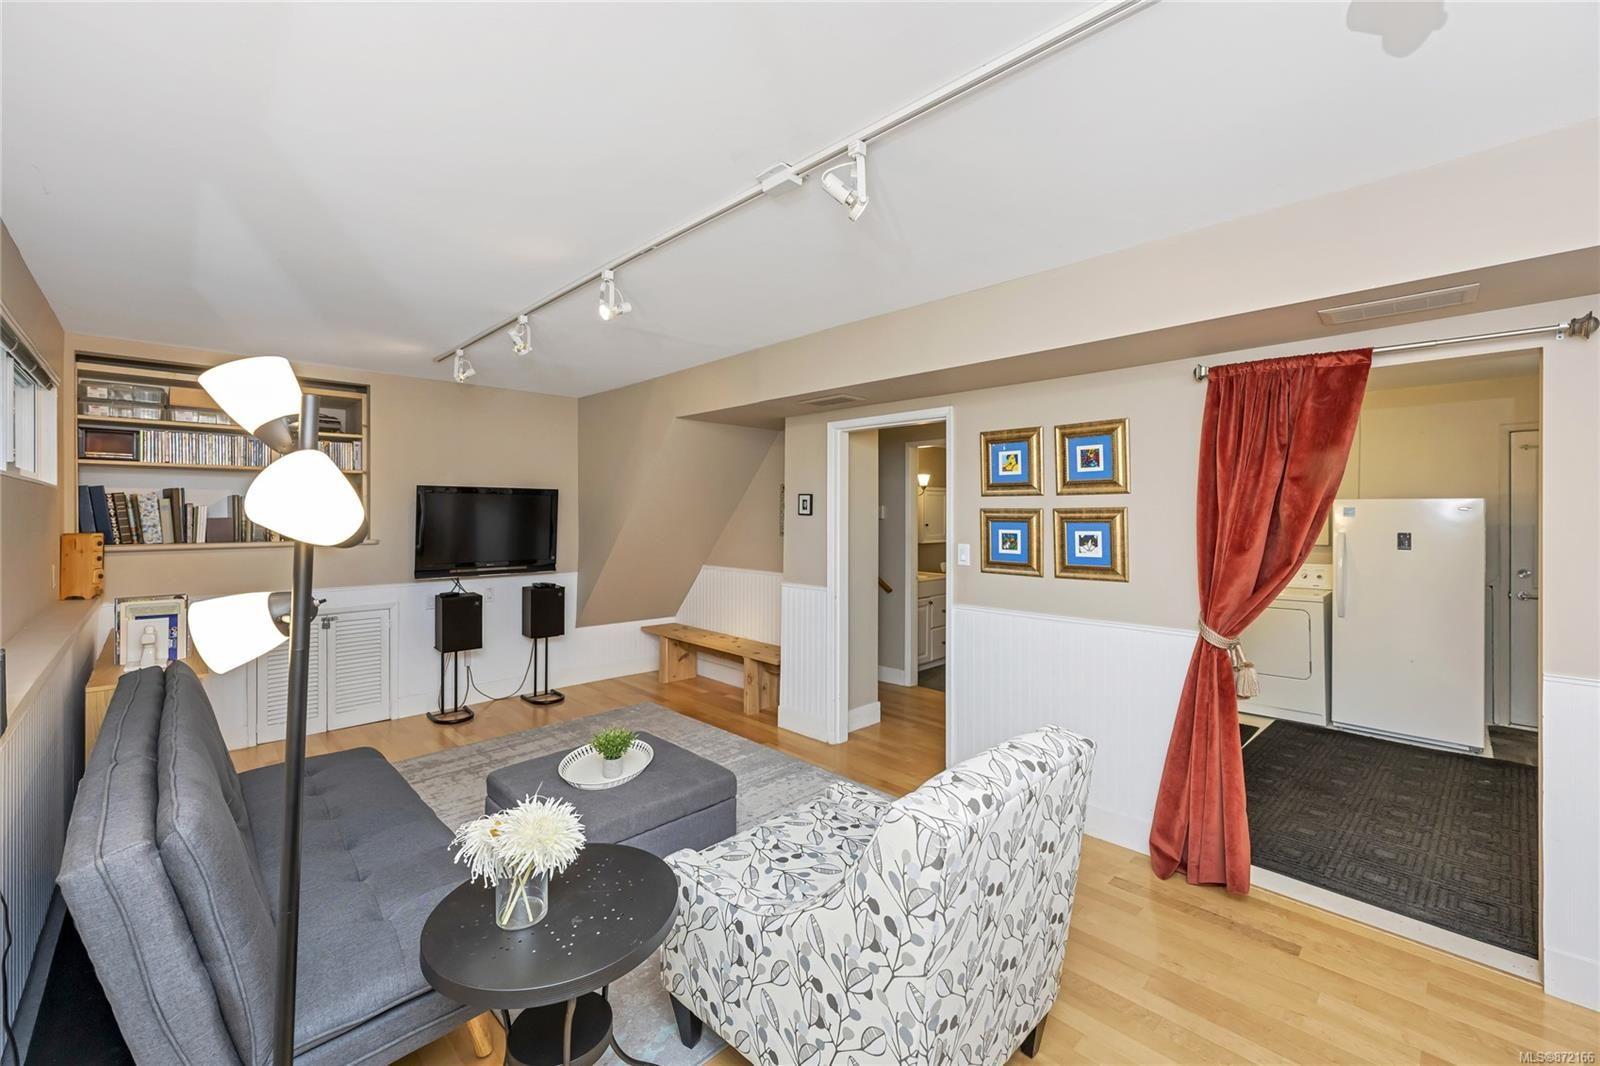 Photo 17: Photos: 1690 Blair Ave in : SE Lambrick Park House for sale (Saanich East)  : MLS®# 872166